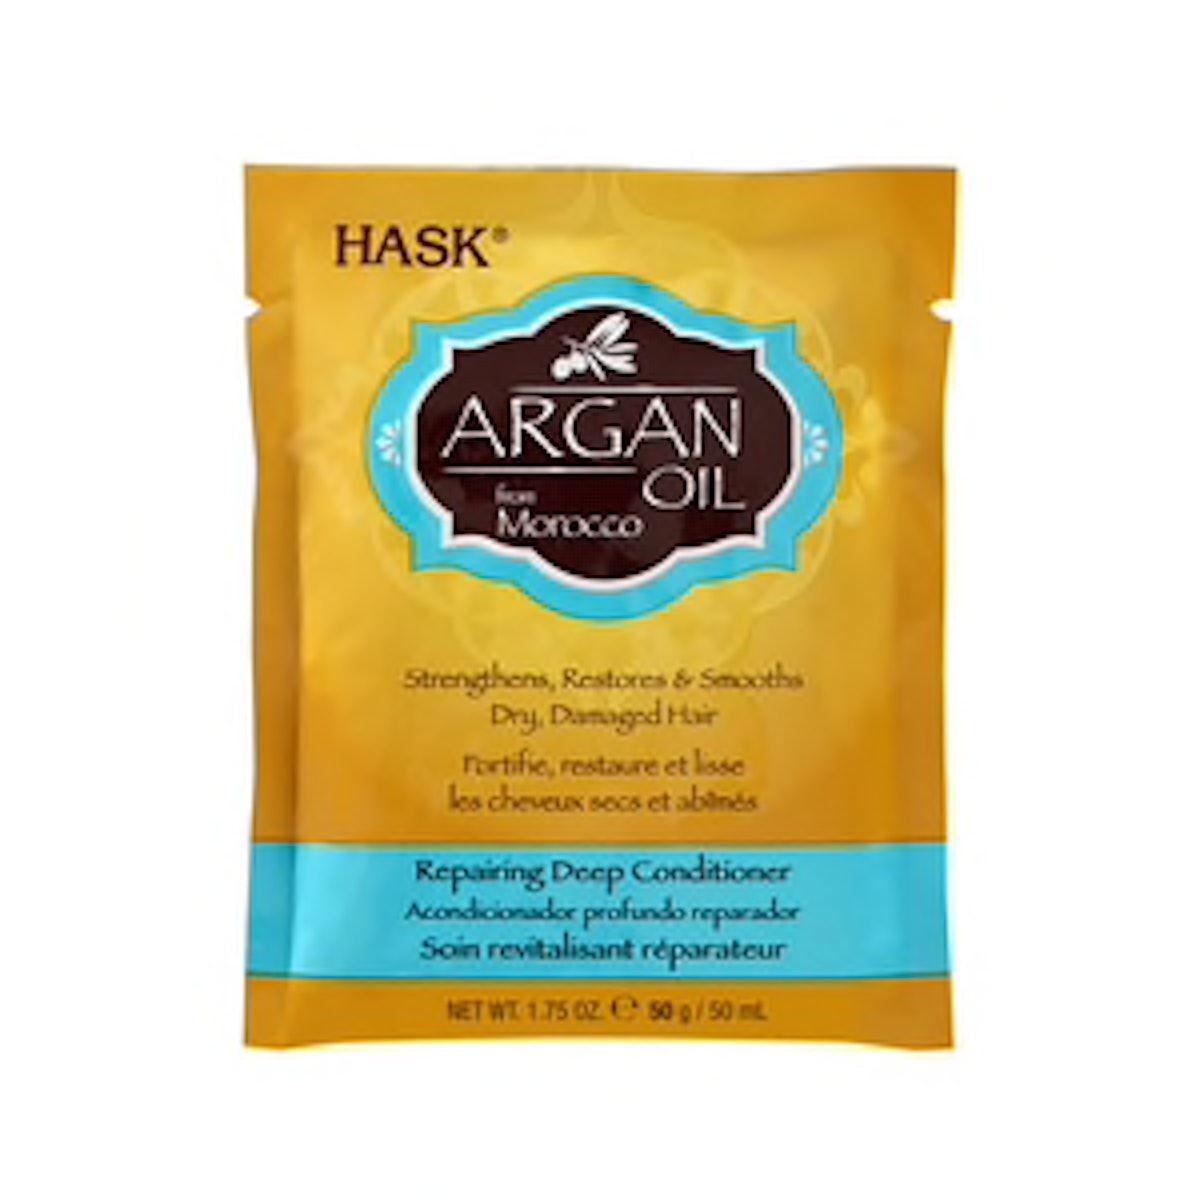 HASK Argan Oil Repairing Deep Conditioner Packette